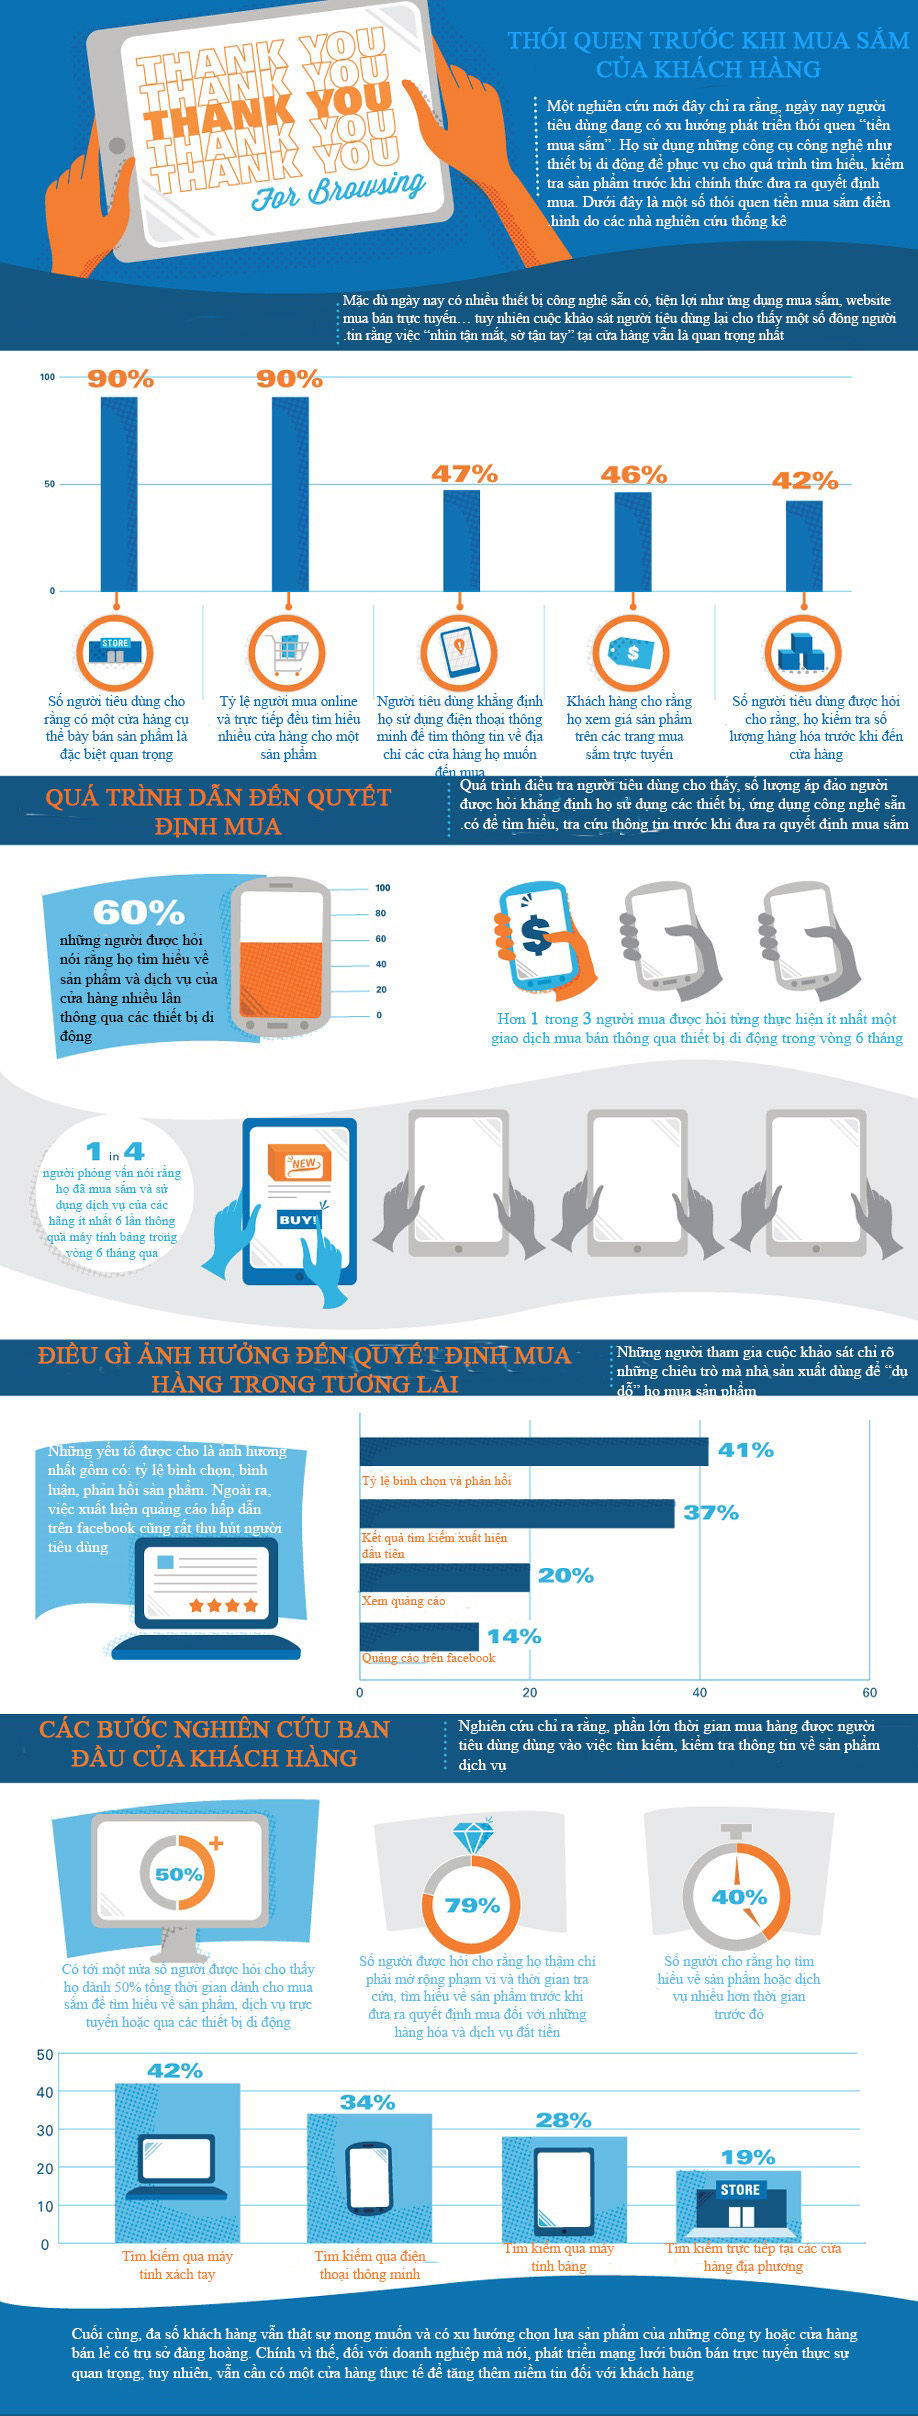 infographic-khach-hang-nghi-gi-va-lam-gi-truoc-khi-mua-sam